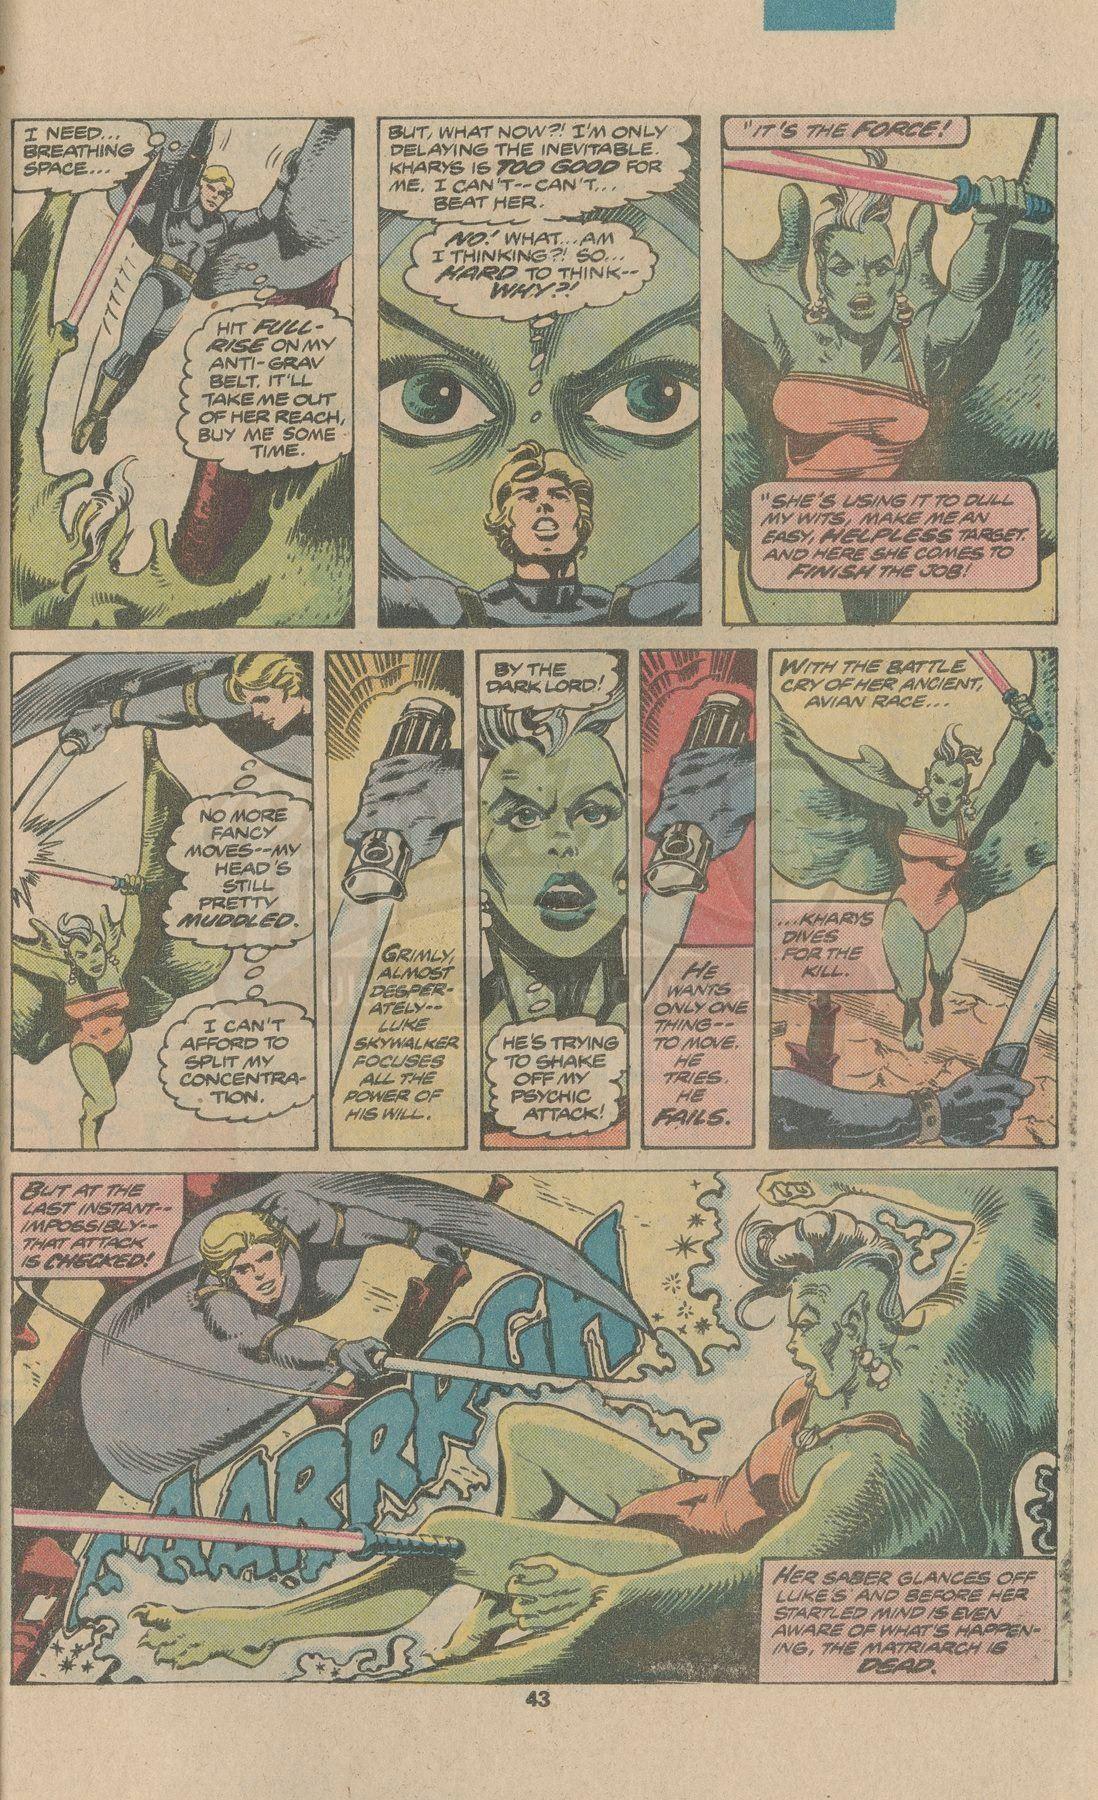 STAR WARS ANNUAL #1 (1979) - Mike Vosburg and Steve Leialoha